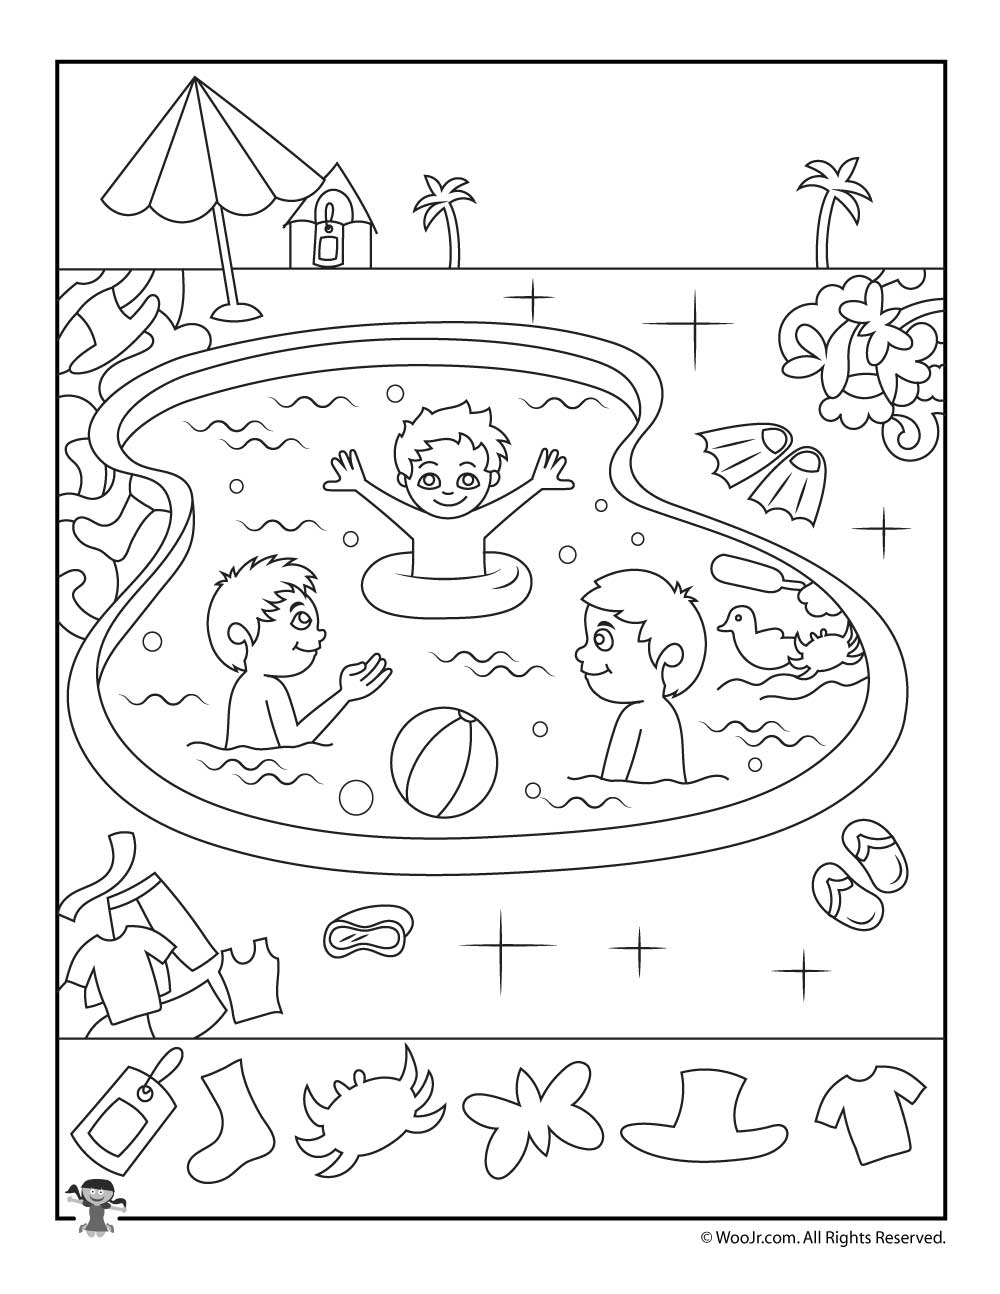 Swimming Pool Summer Hidden Pictures Page Woo Jr Kids Activities